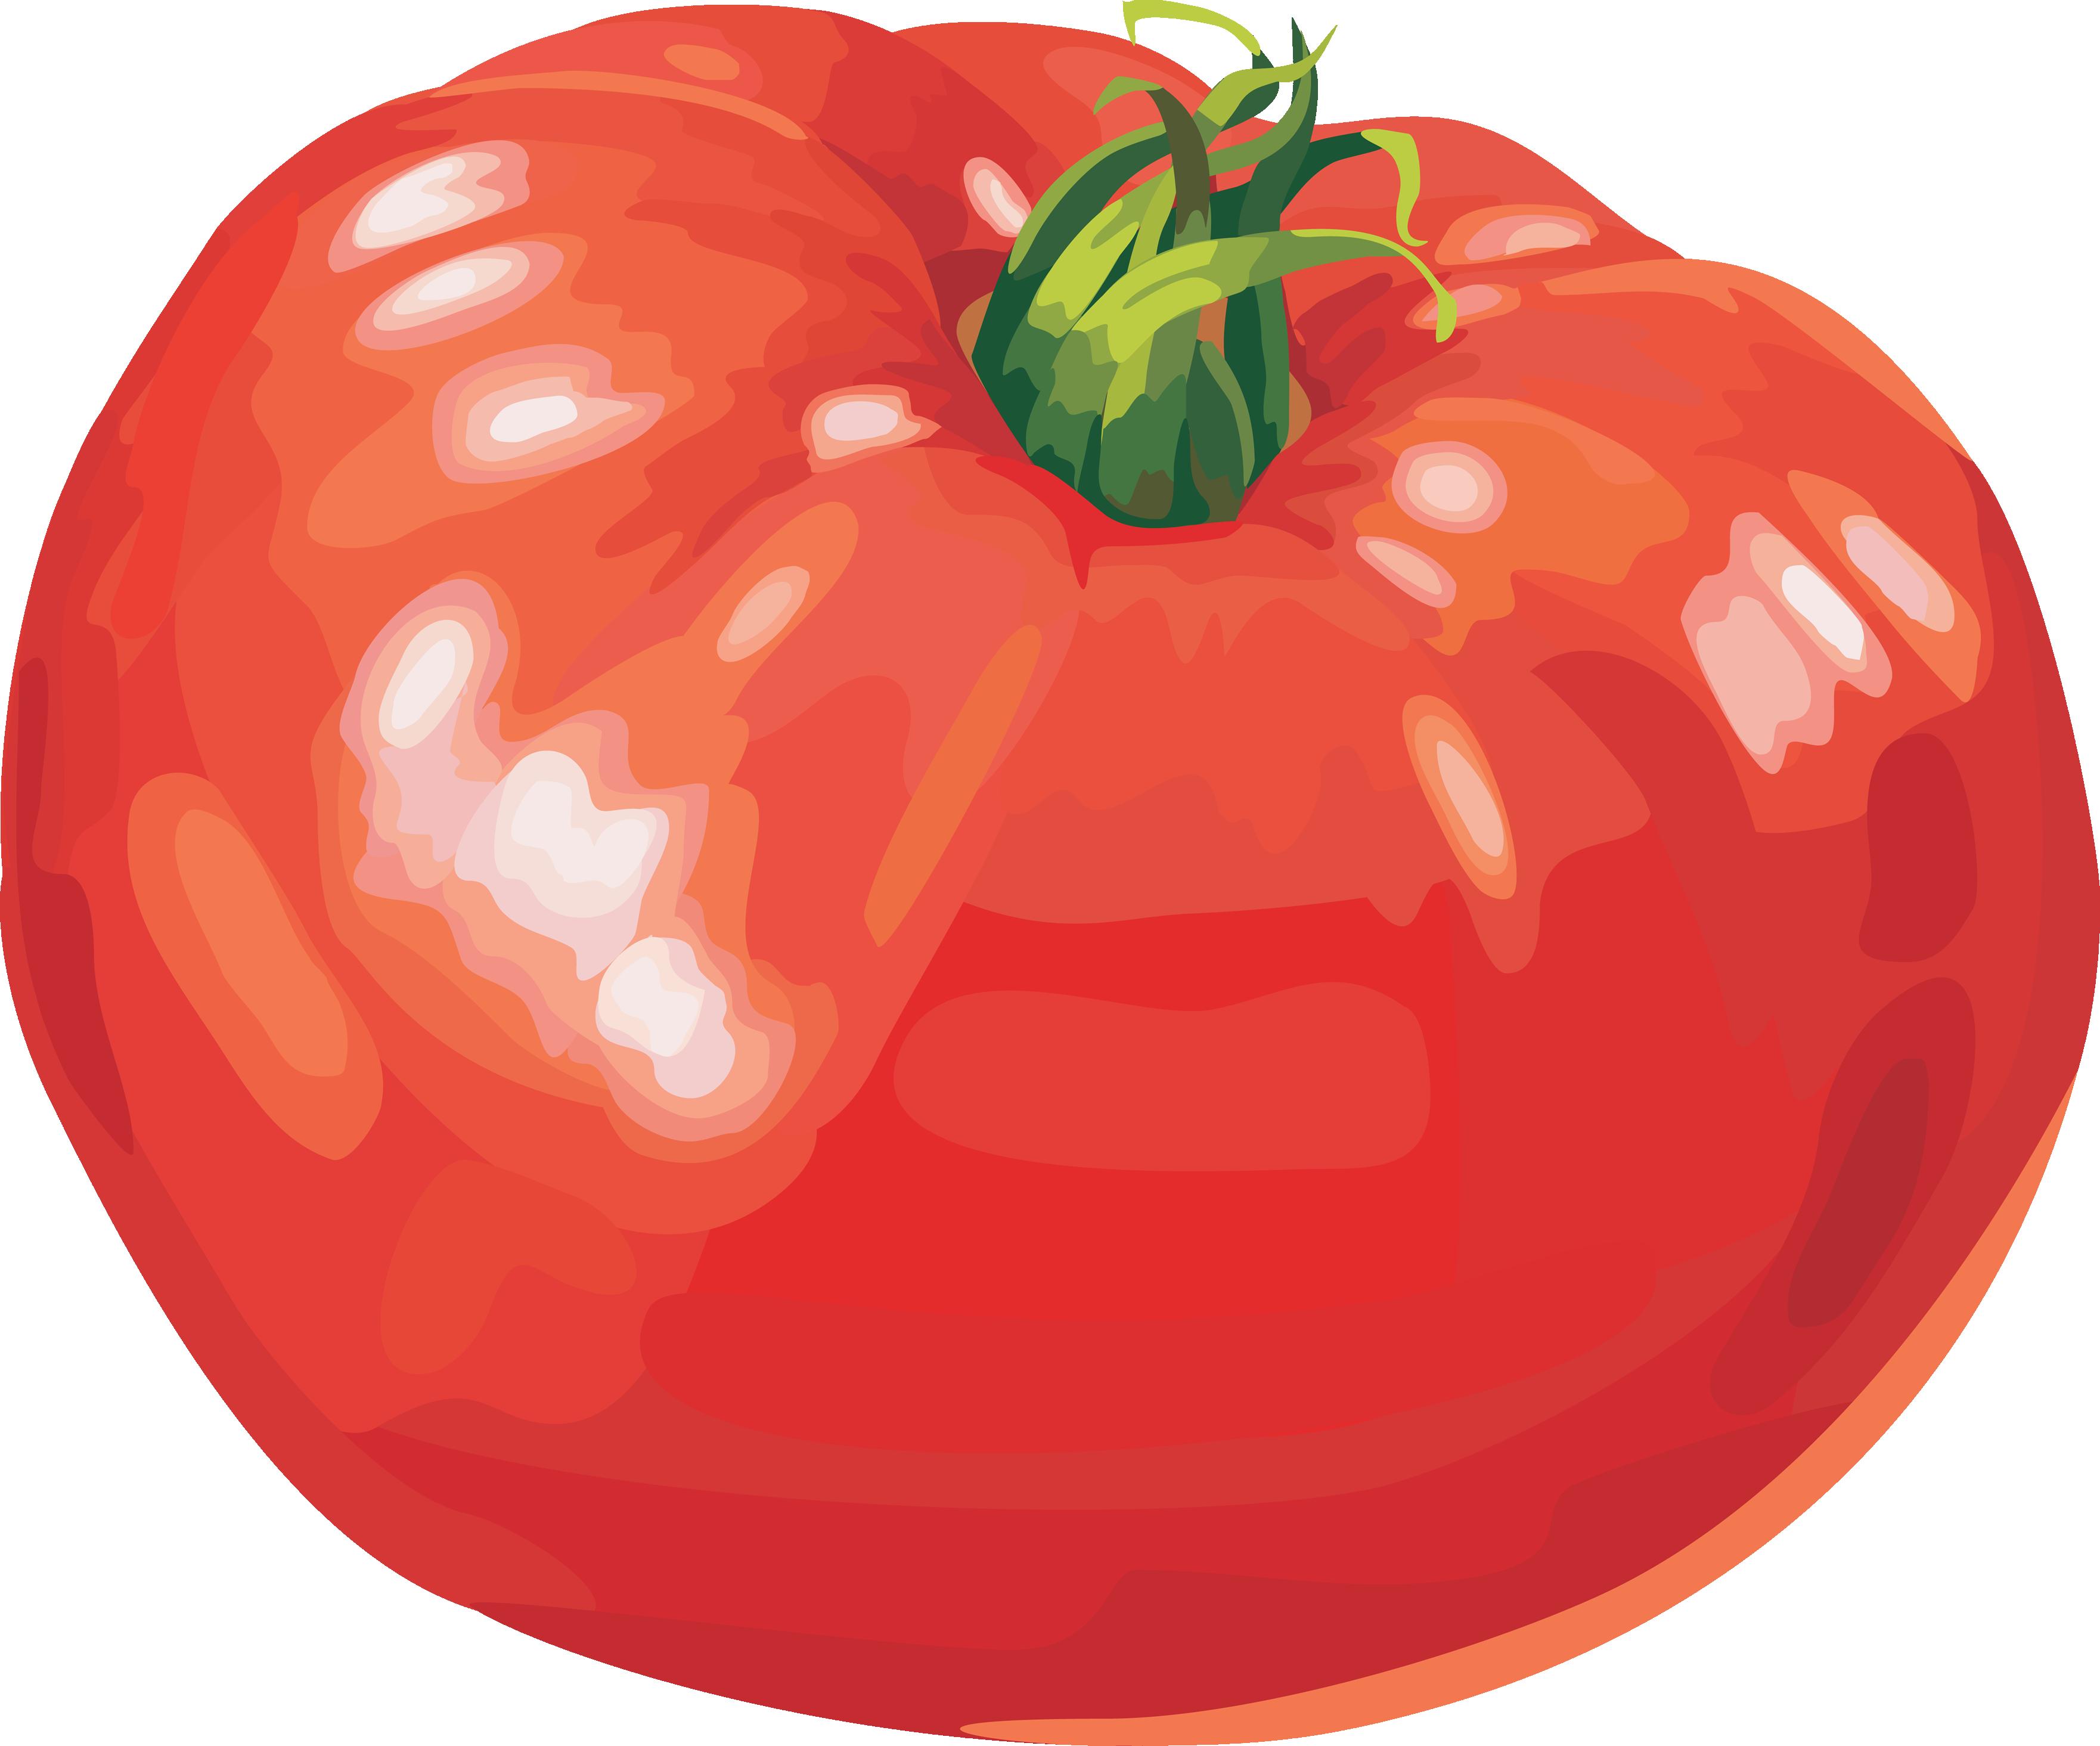 Tomato seventeen isolated stock. Tomatoes clipart fresh